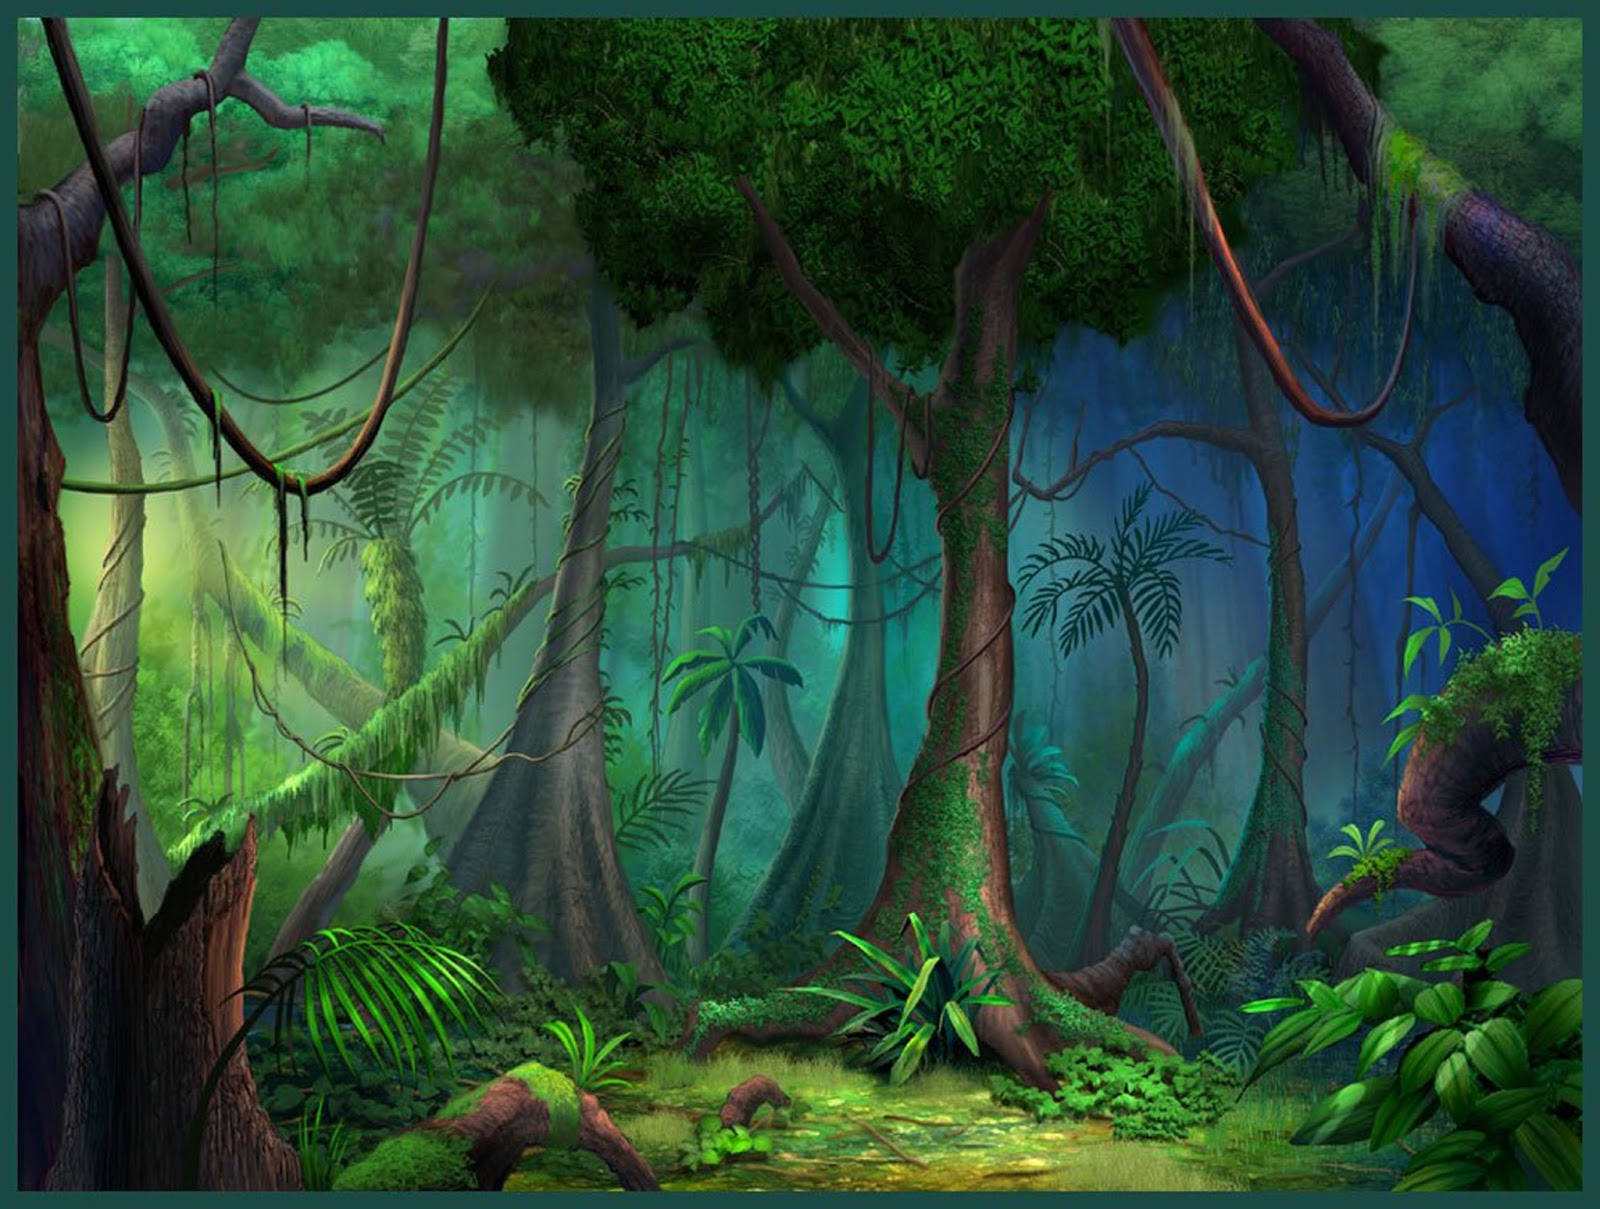 Fondo De Pantalla Selva: Fondo De Pantalla Para Niños Pequeños Selva Verde